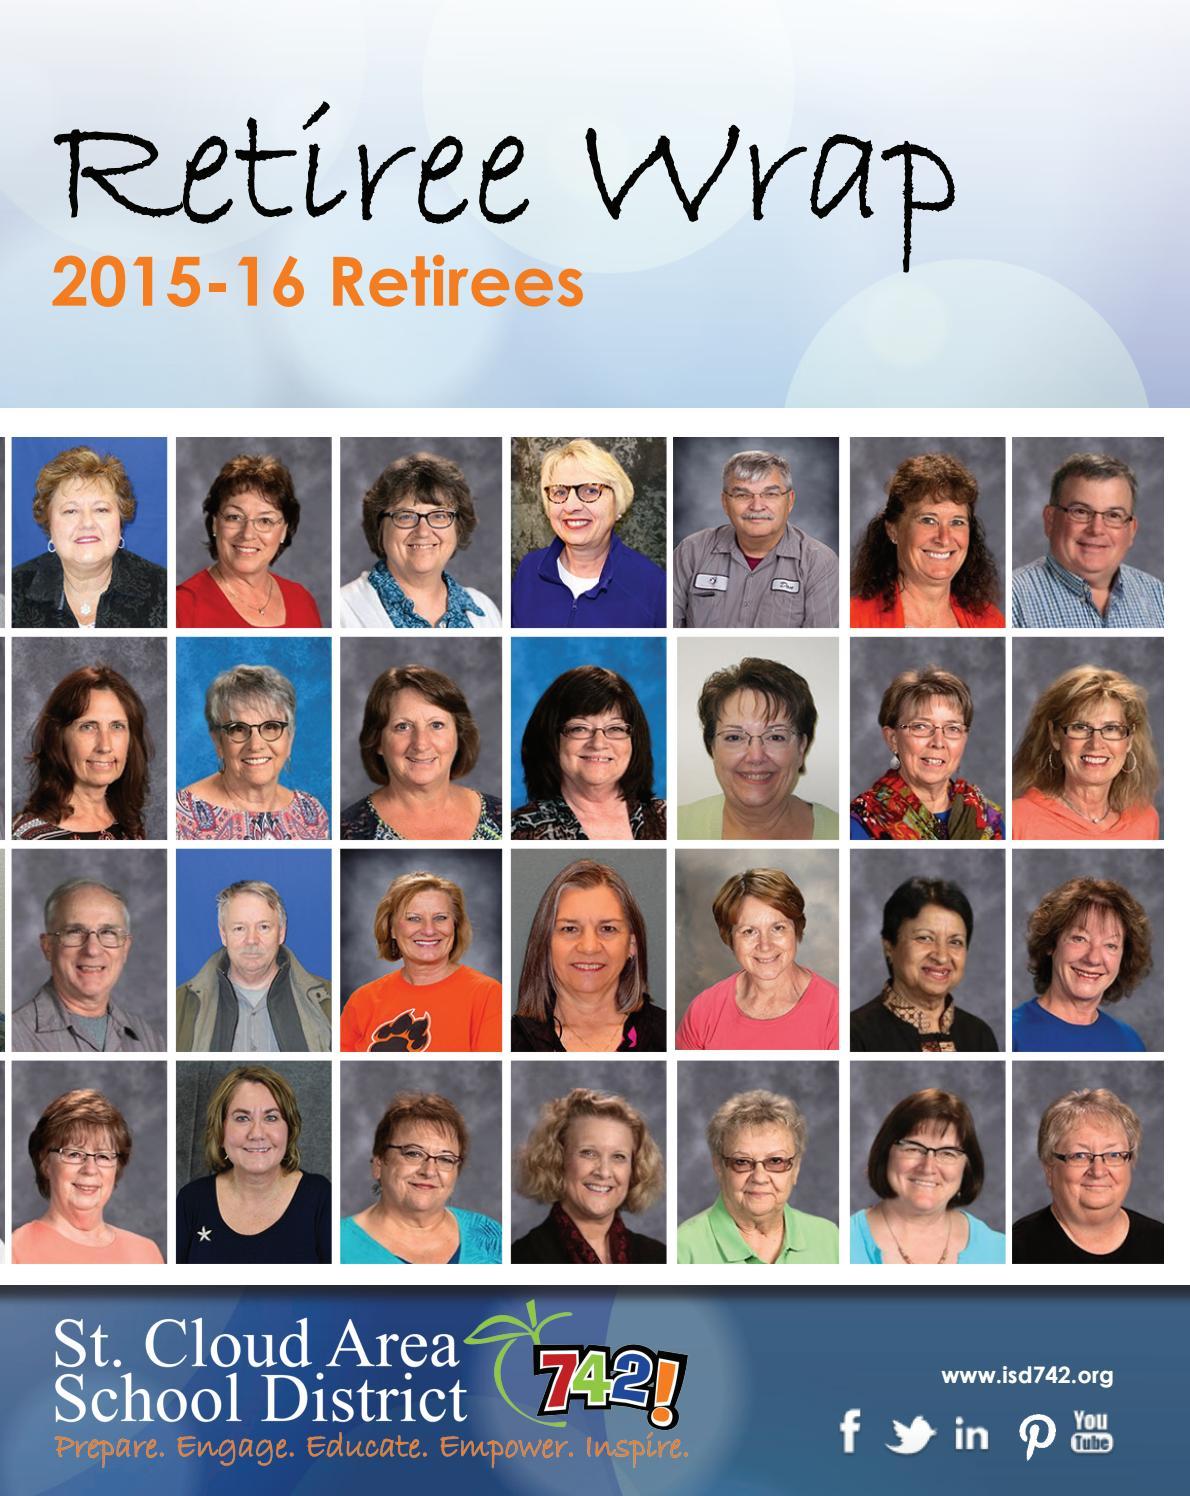 Retiree Wrap 2015 16 By St Cloud Area School District 742 Issuu